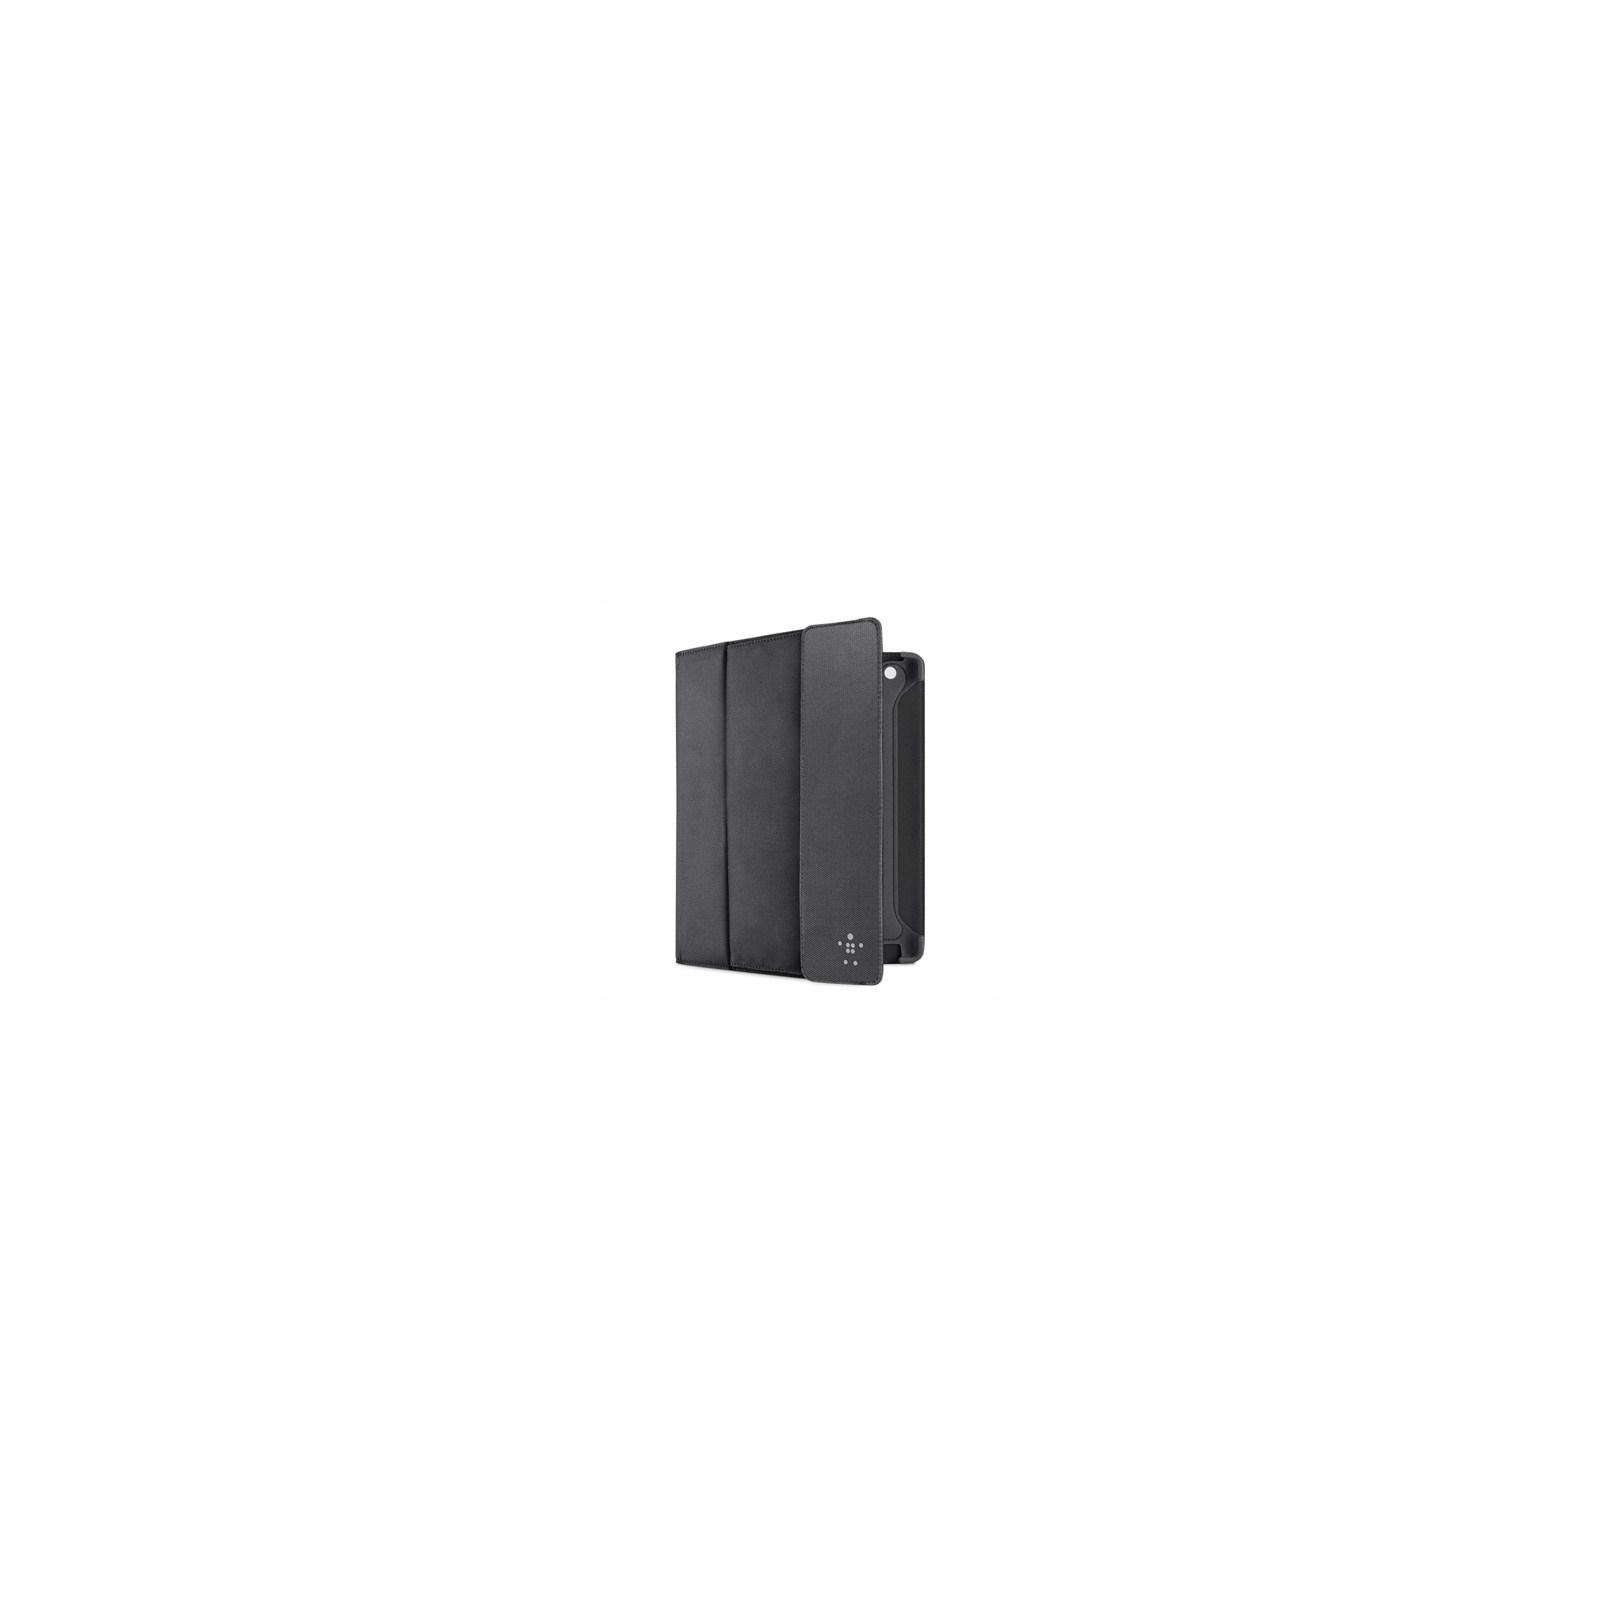 Чехол для планшета Belkin Folio Pocket POLY (Black) (F8N747cwC00)